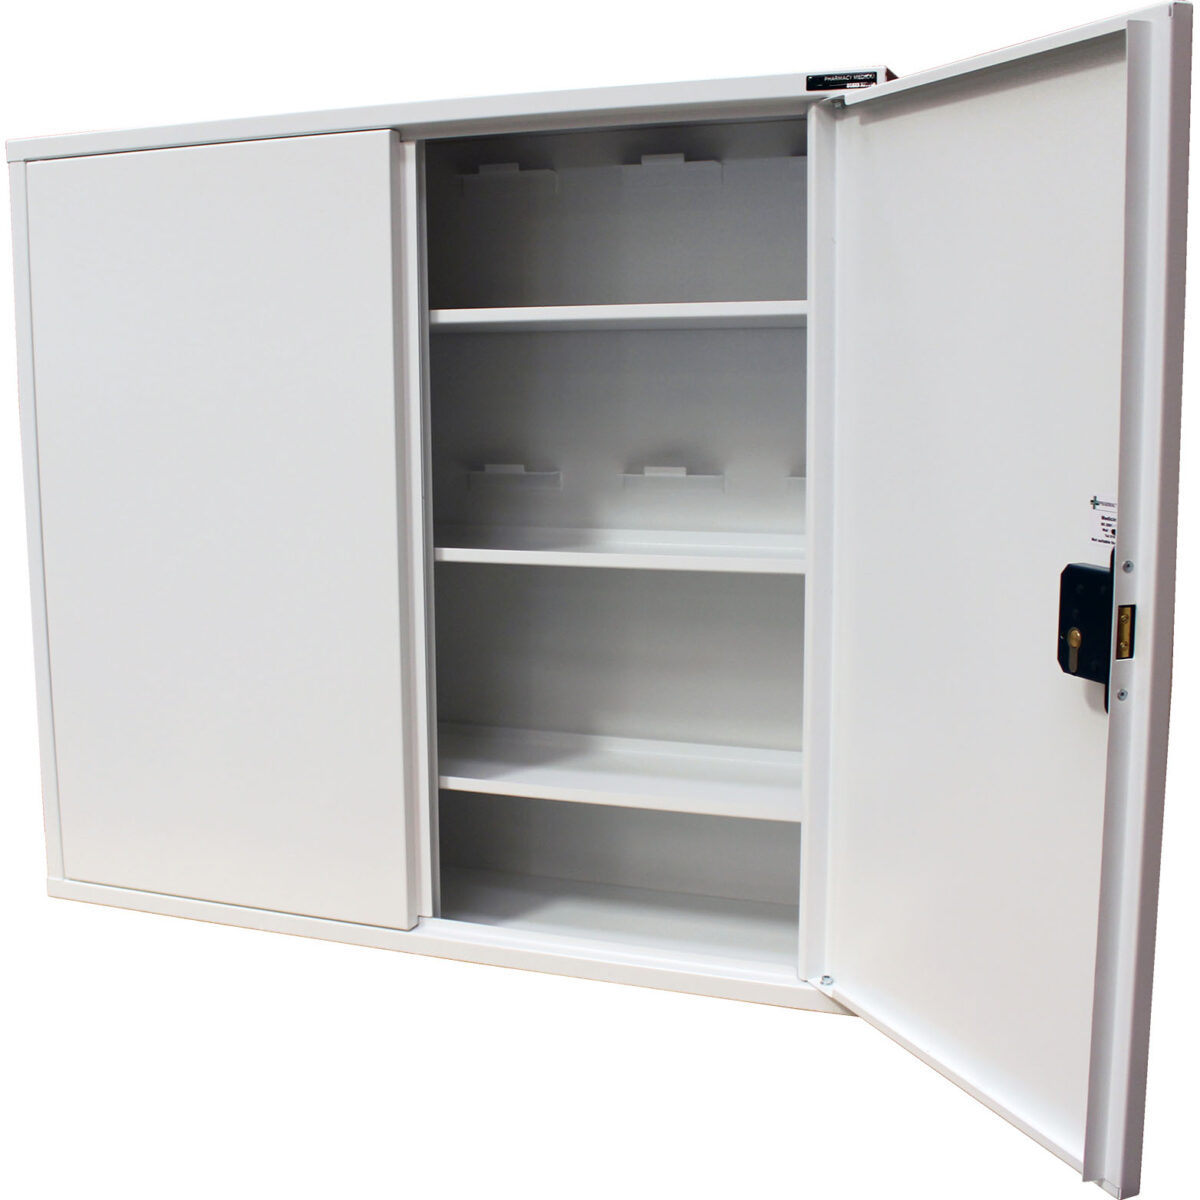 HECMC404 Medicine cabinet